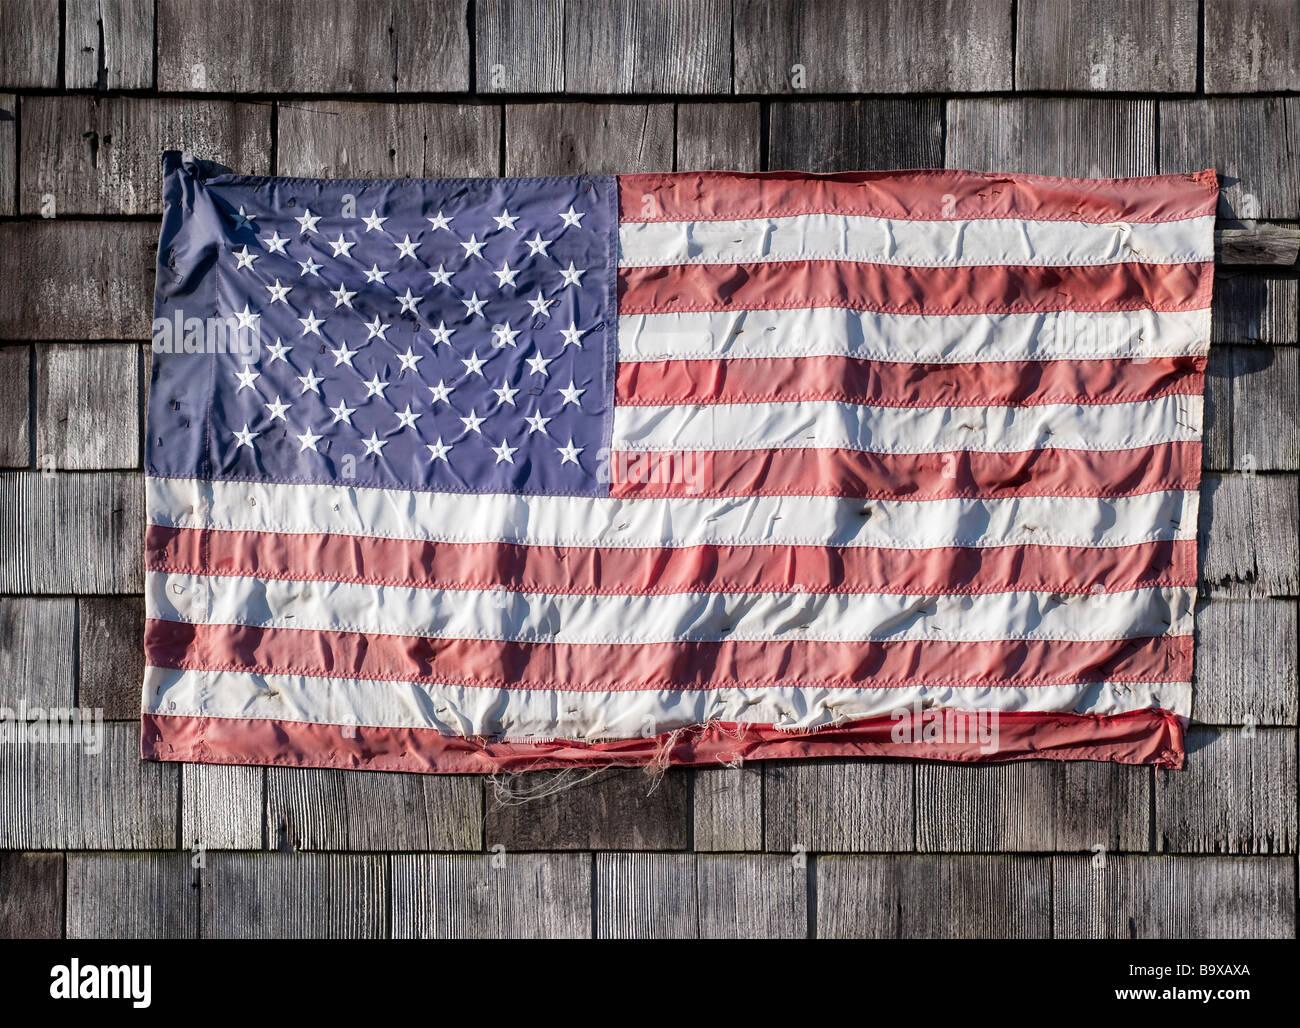 Worn American flag - Stock Image